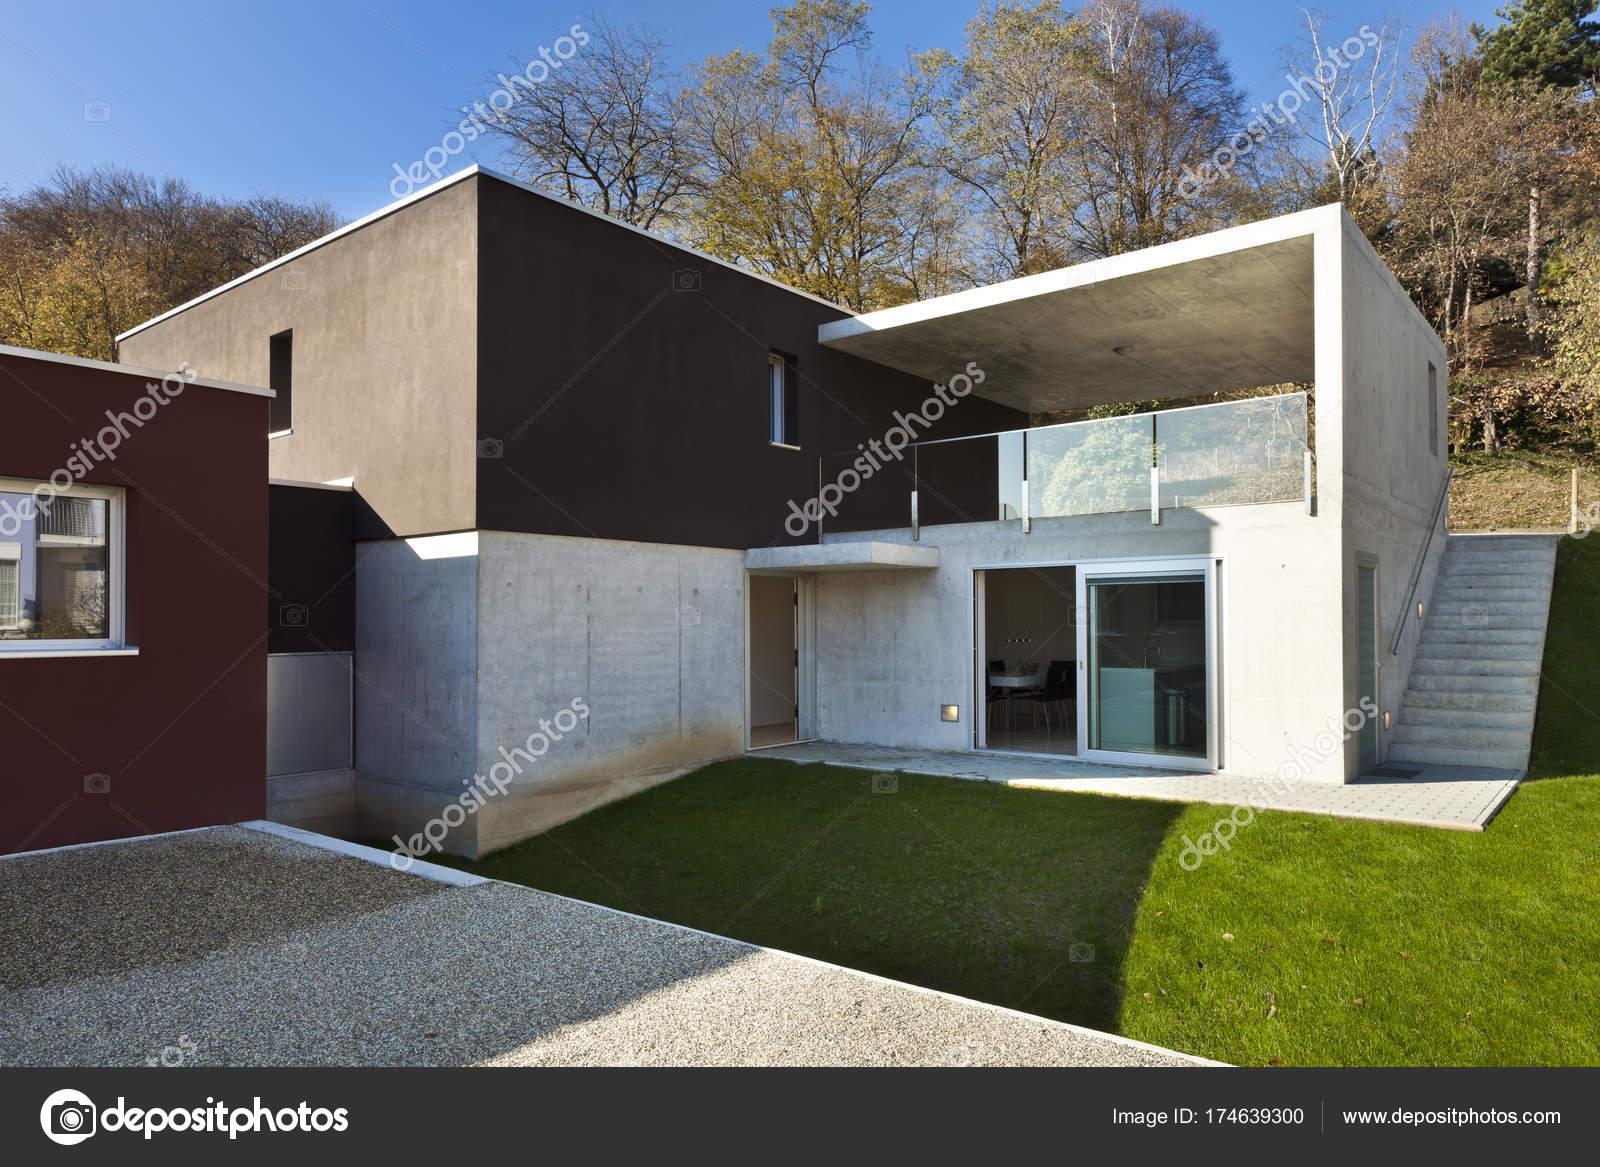 Moderne huis buiten u2014 stockfoto © zveiger #174639300